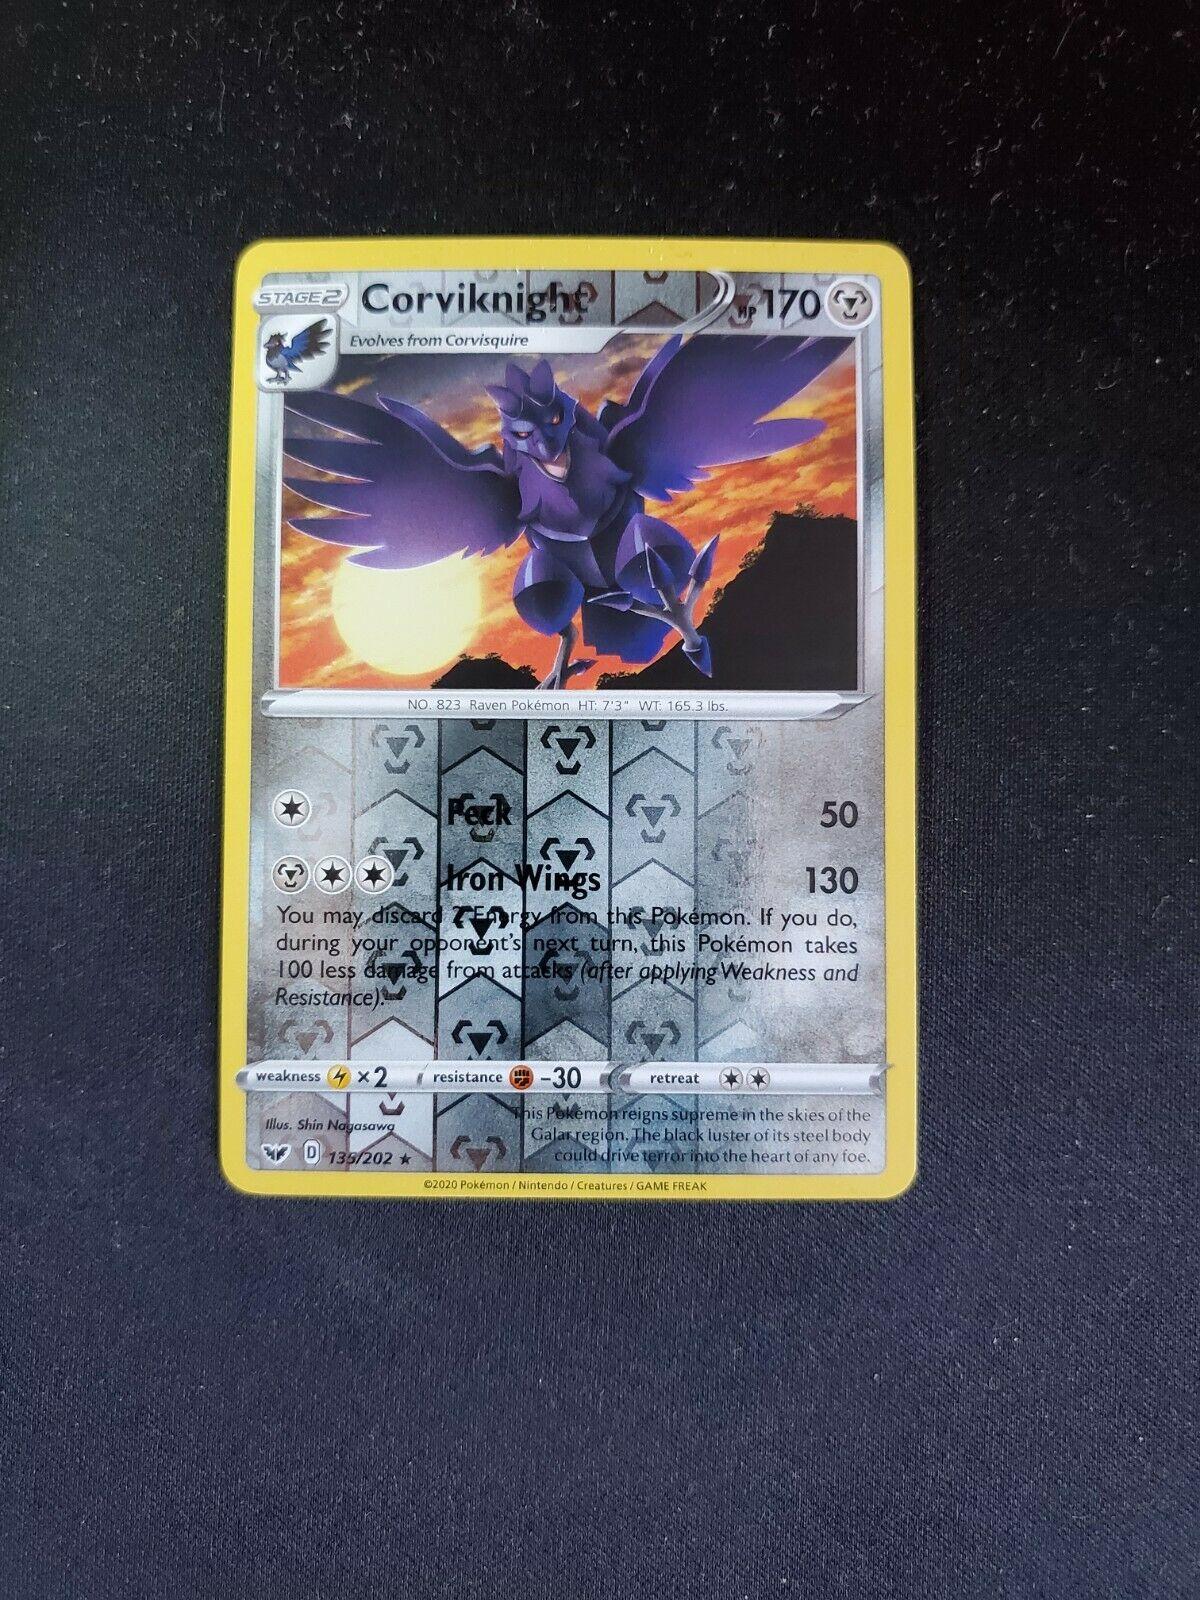 Corviknight 2020 Pokémon Sword & Shield Reverse Holo #135/202 MT, FREE SHIPPING - Image 1